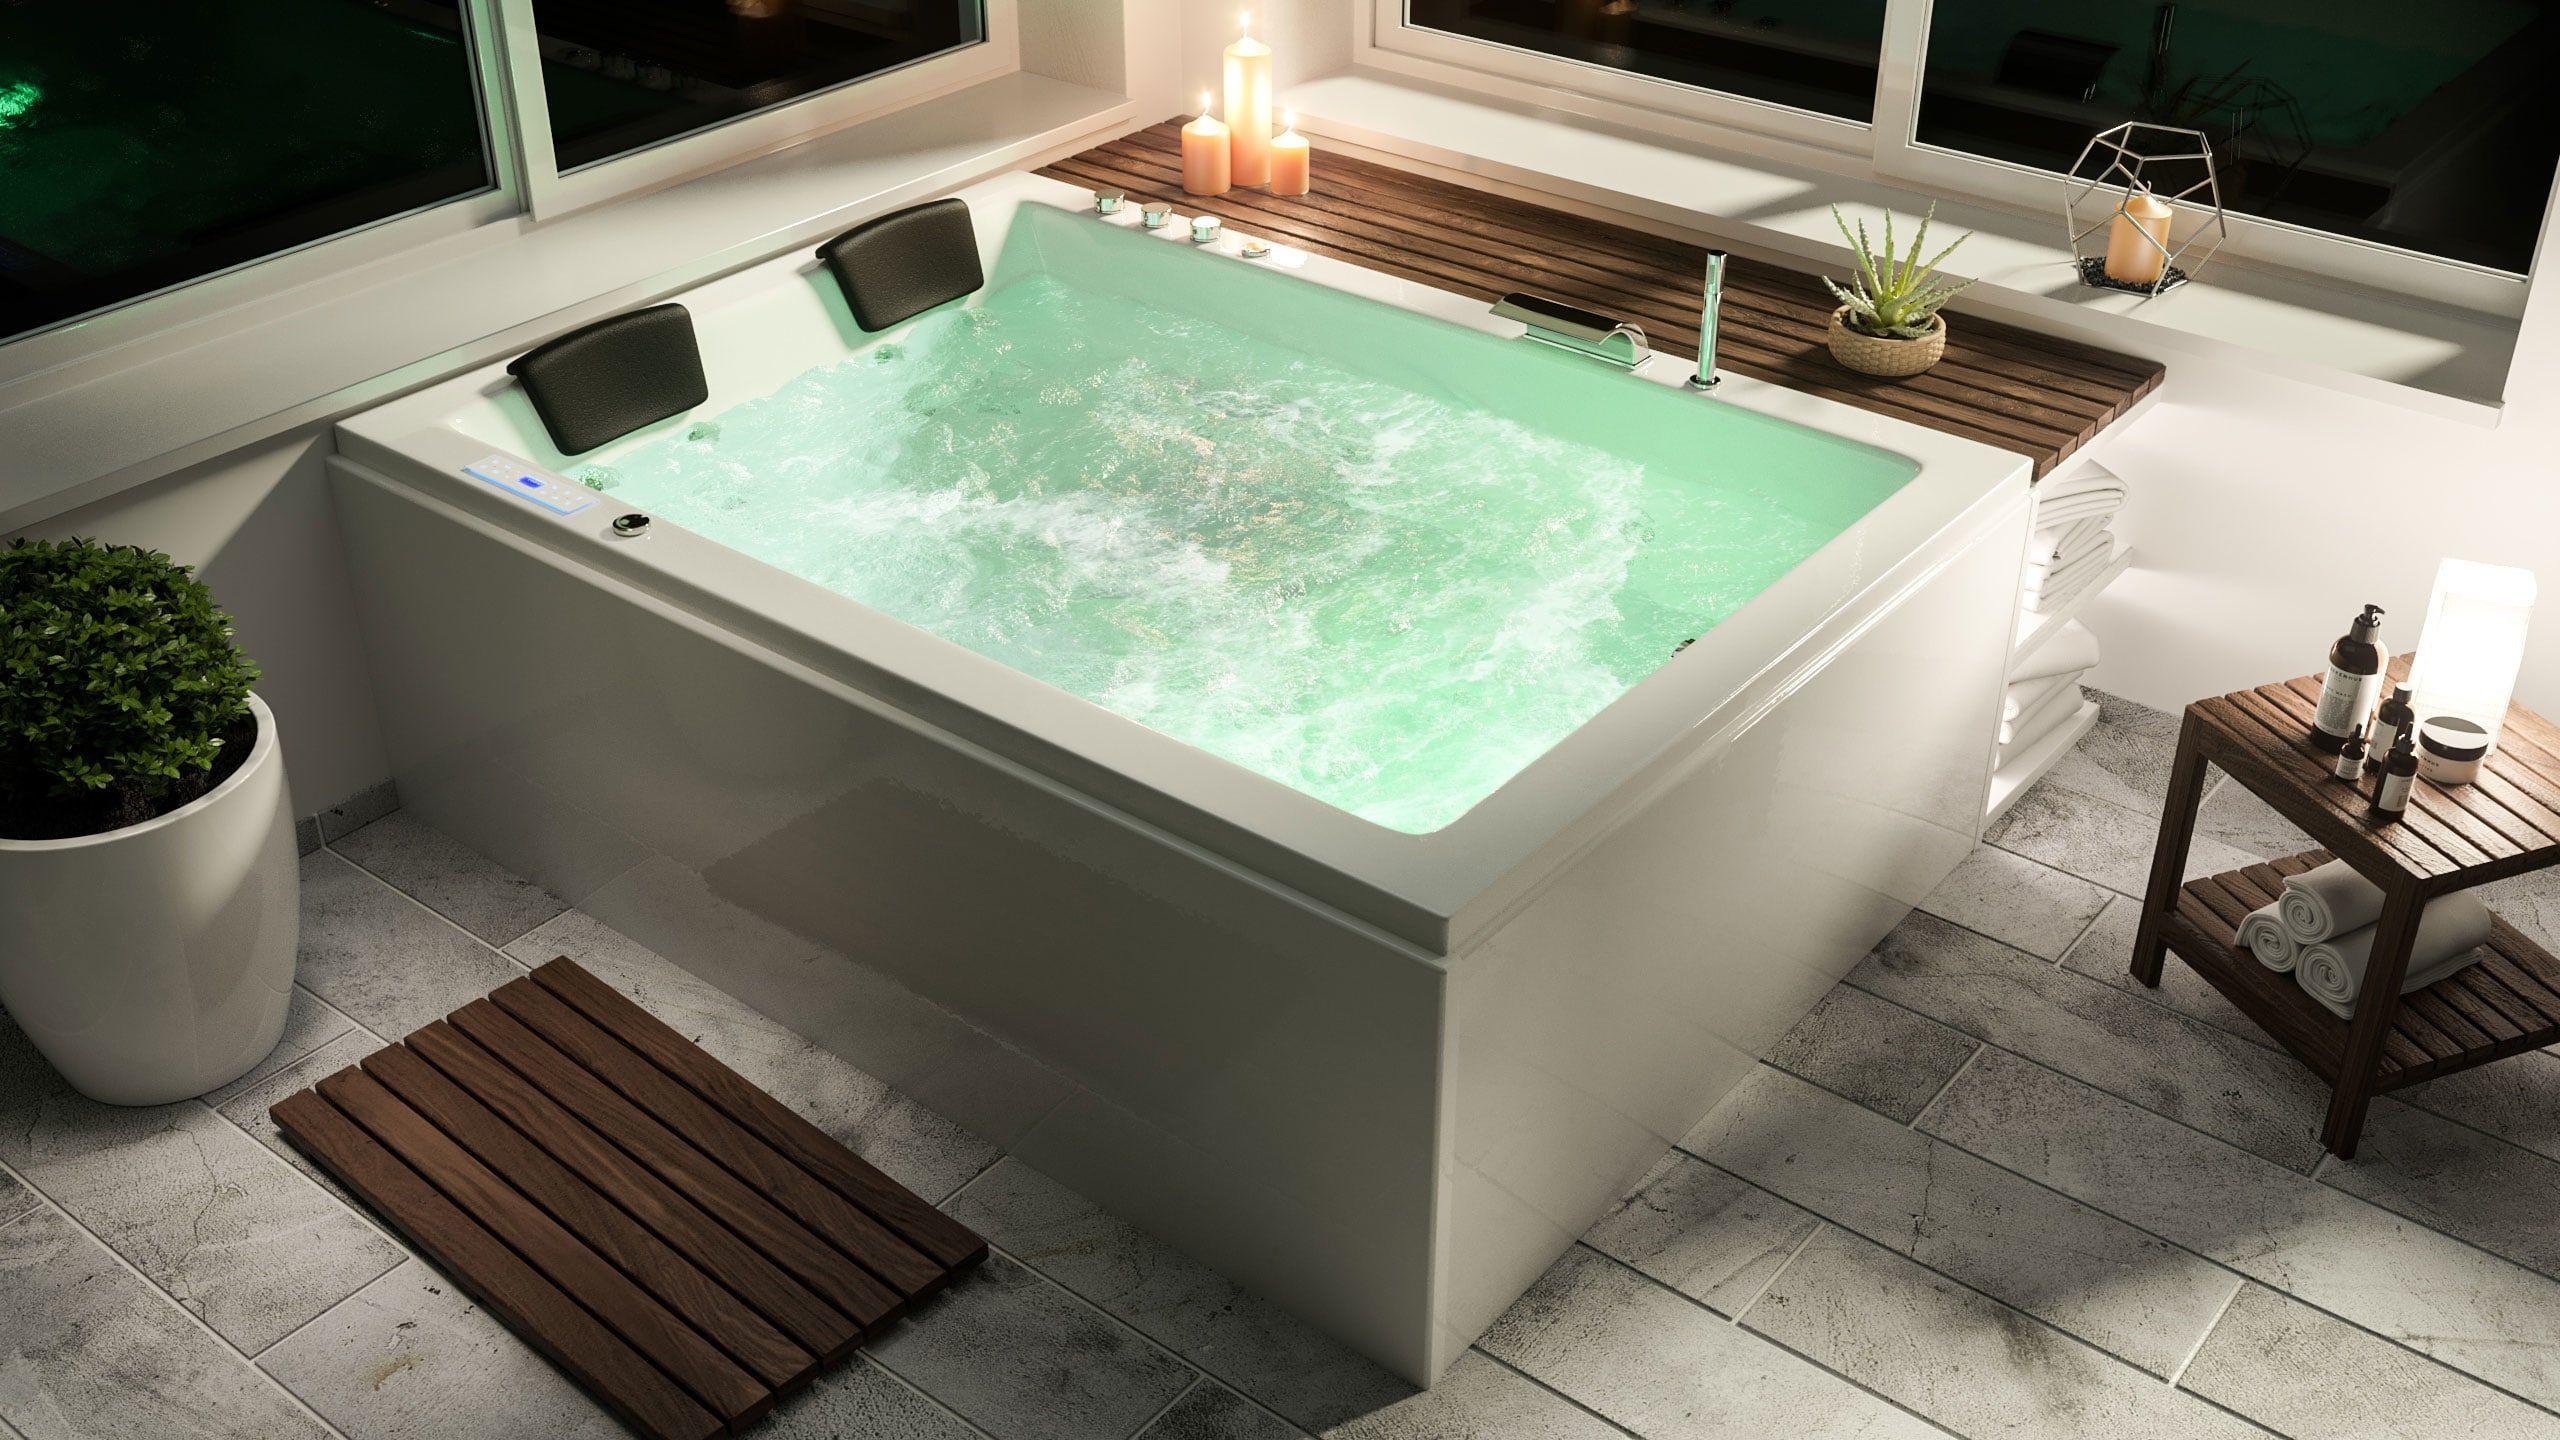 Andalusia Universal Premium Whirlpool Links 180x130x62 Cm Whirlpool Whirlpool Badewanne Pool Liegen